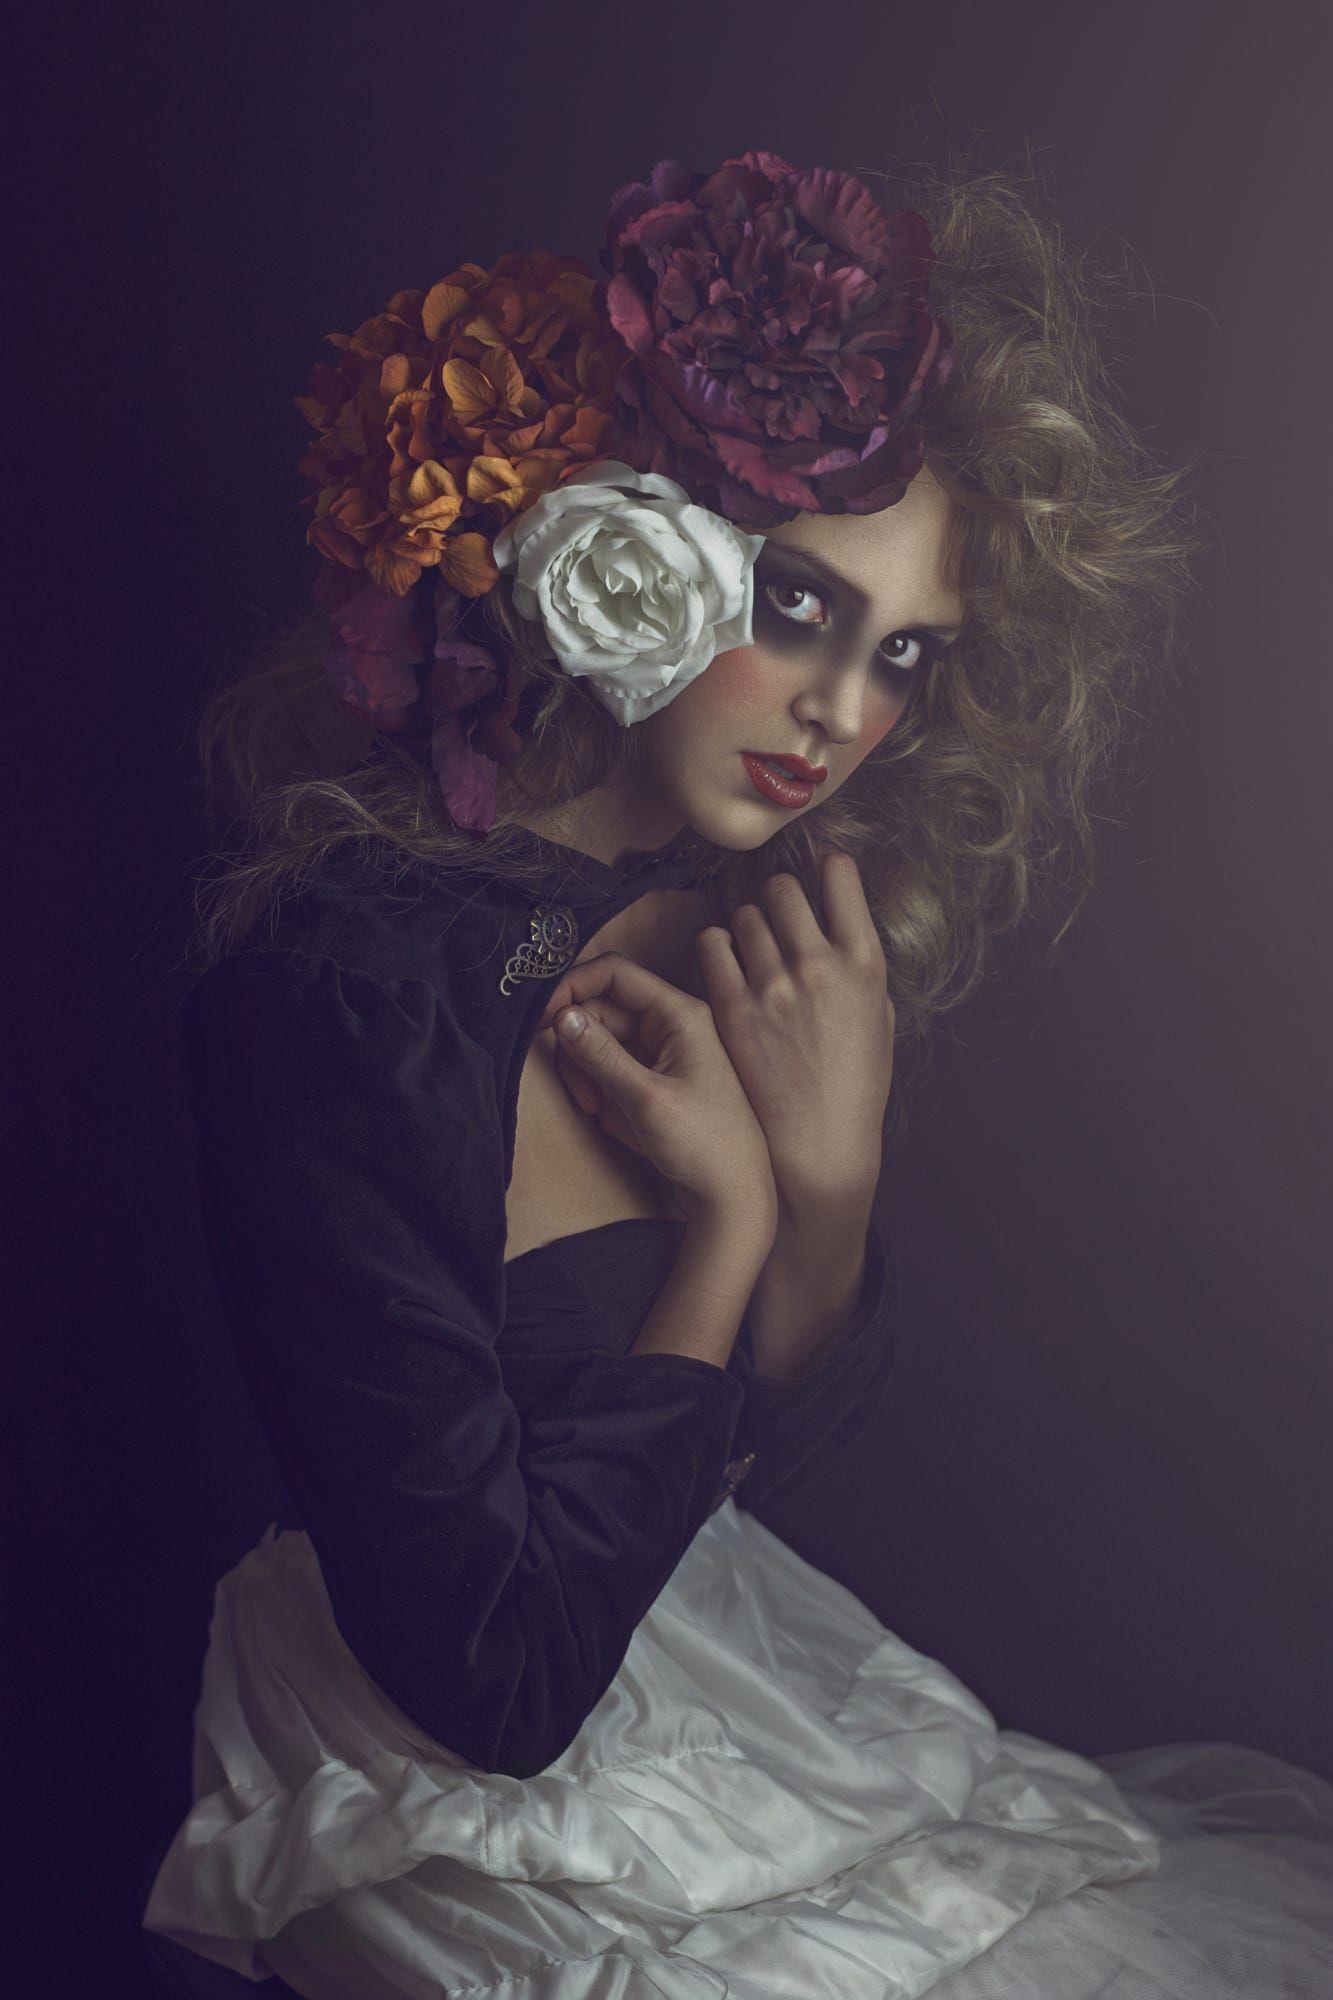 Makeup Aly Goo Hair Lorrie Blais Model Merrick